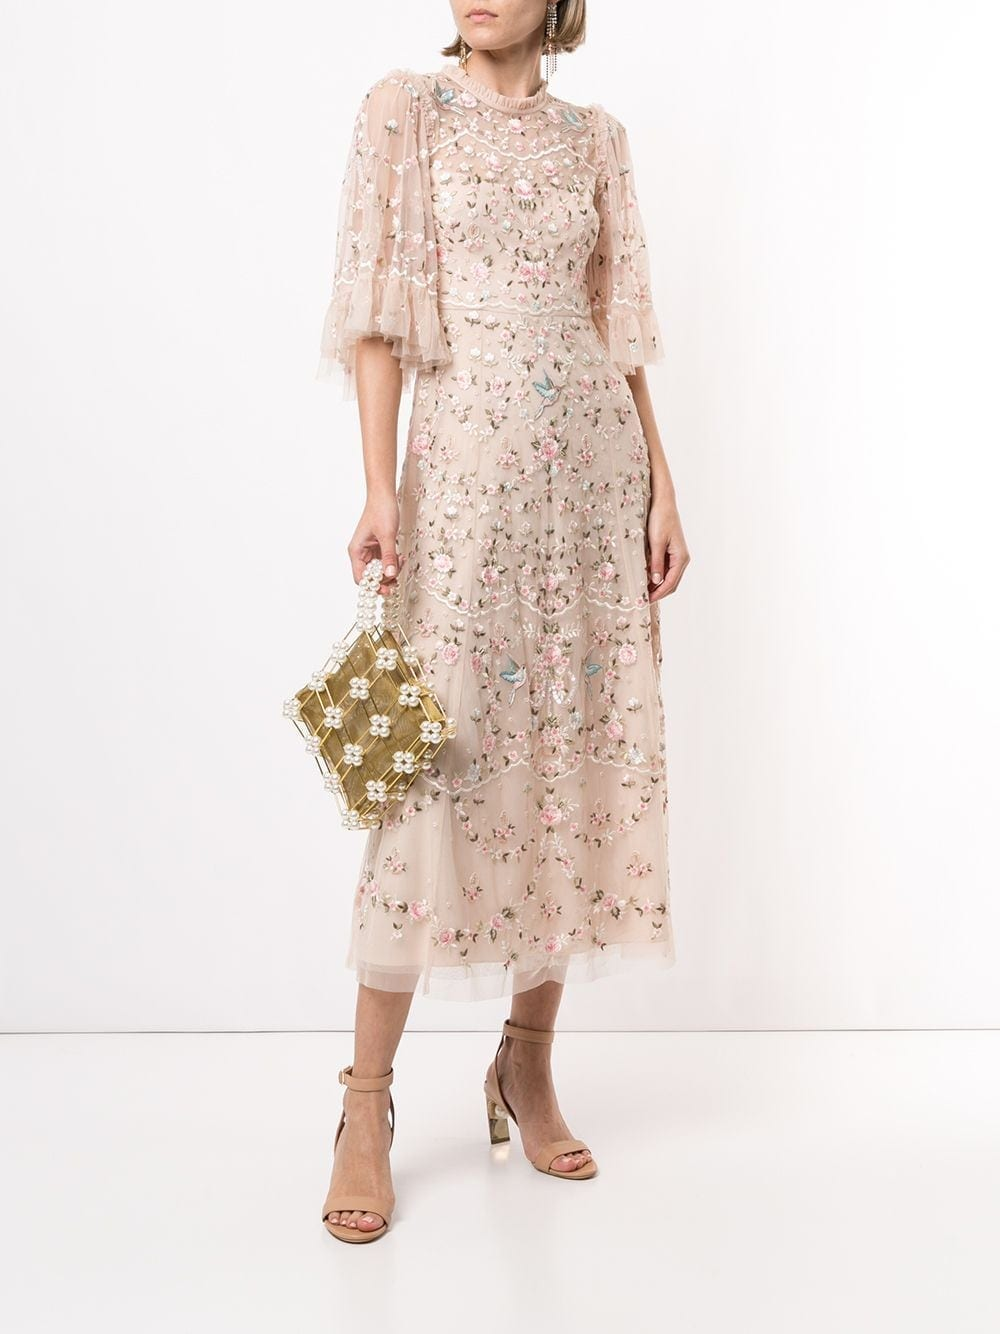 NEEDLE & THREAD Floral Embroidered Tulle Midi Dress